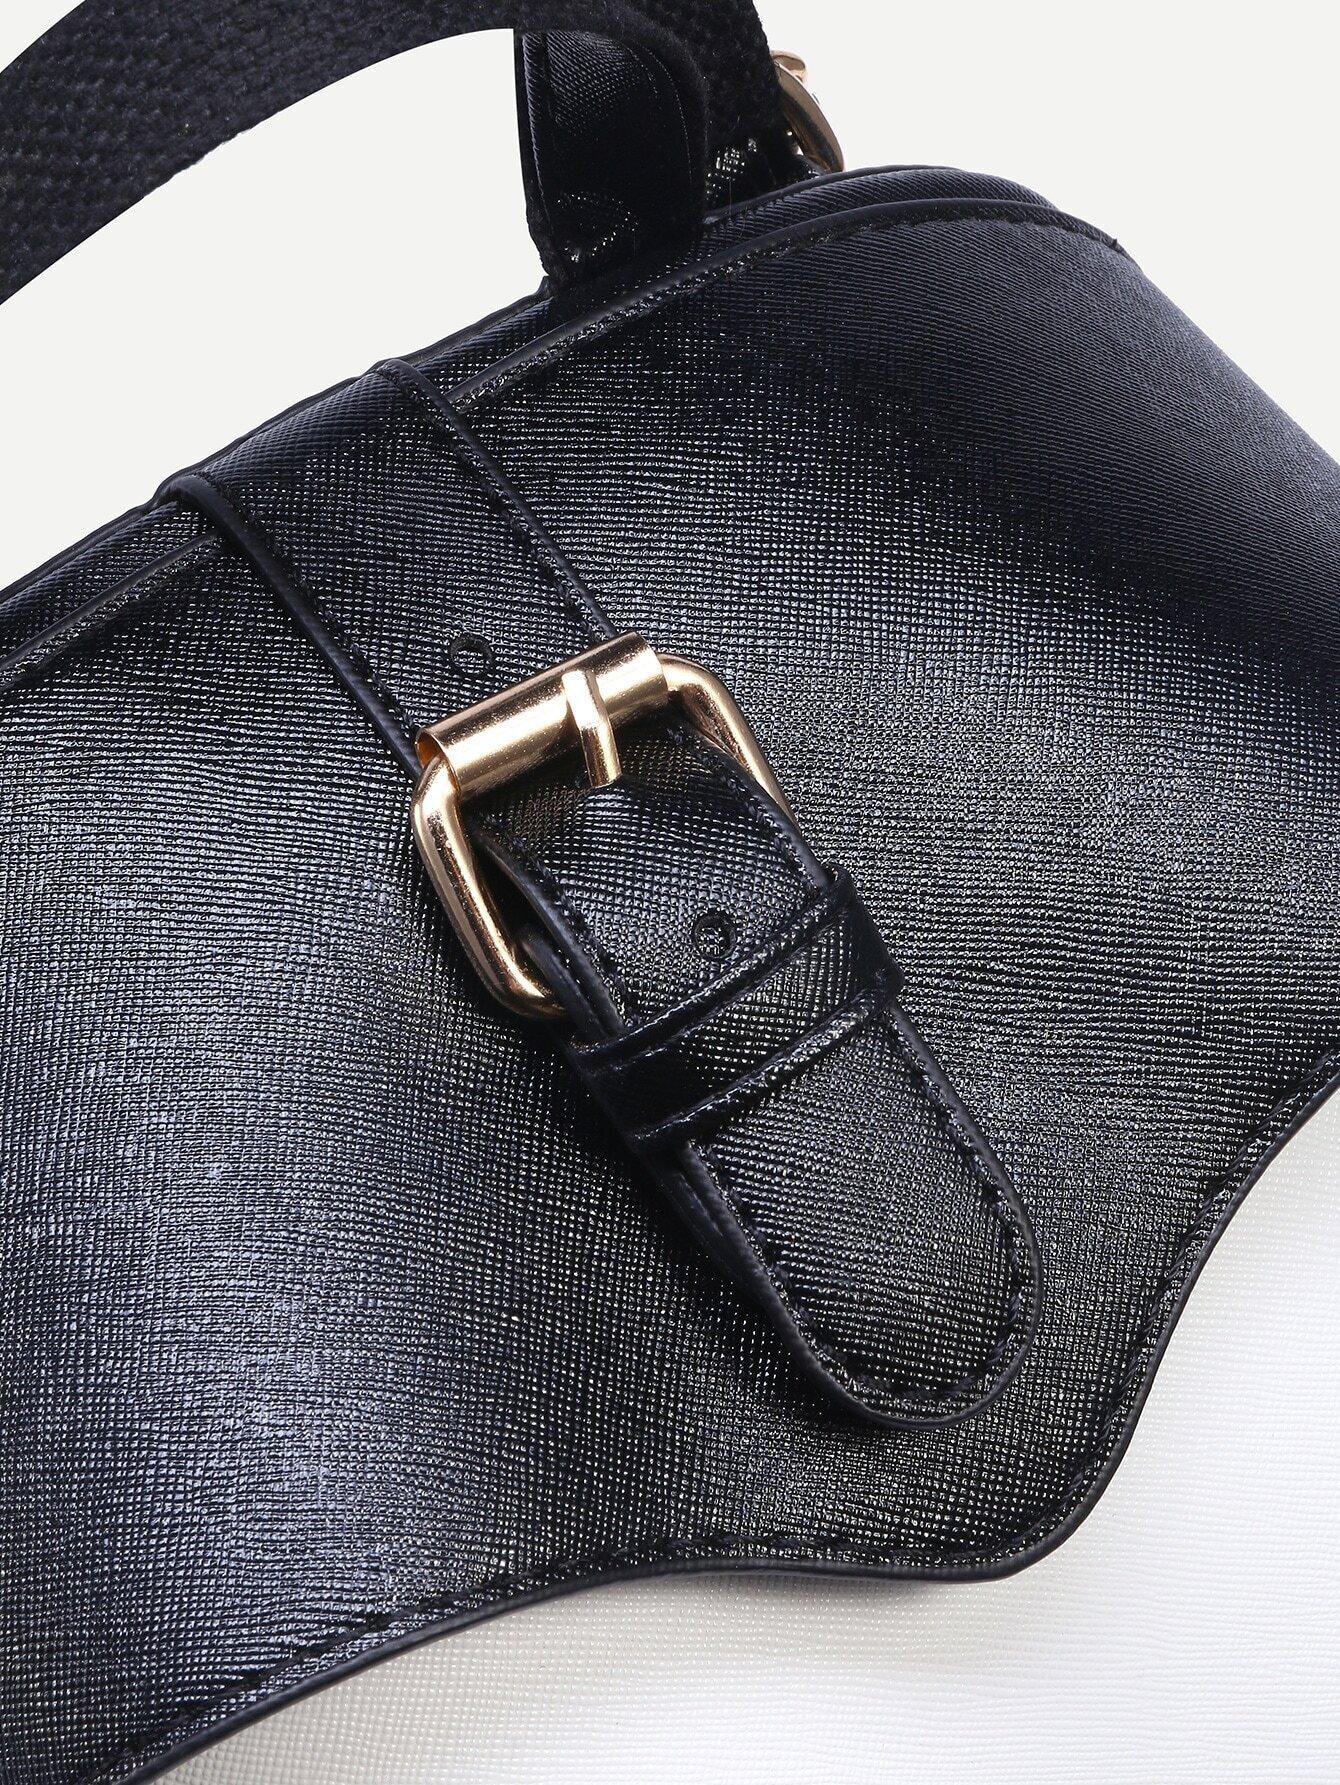 how to make pangolin backpack